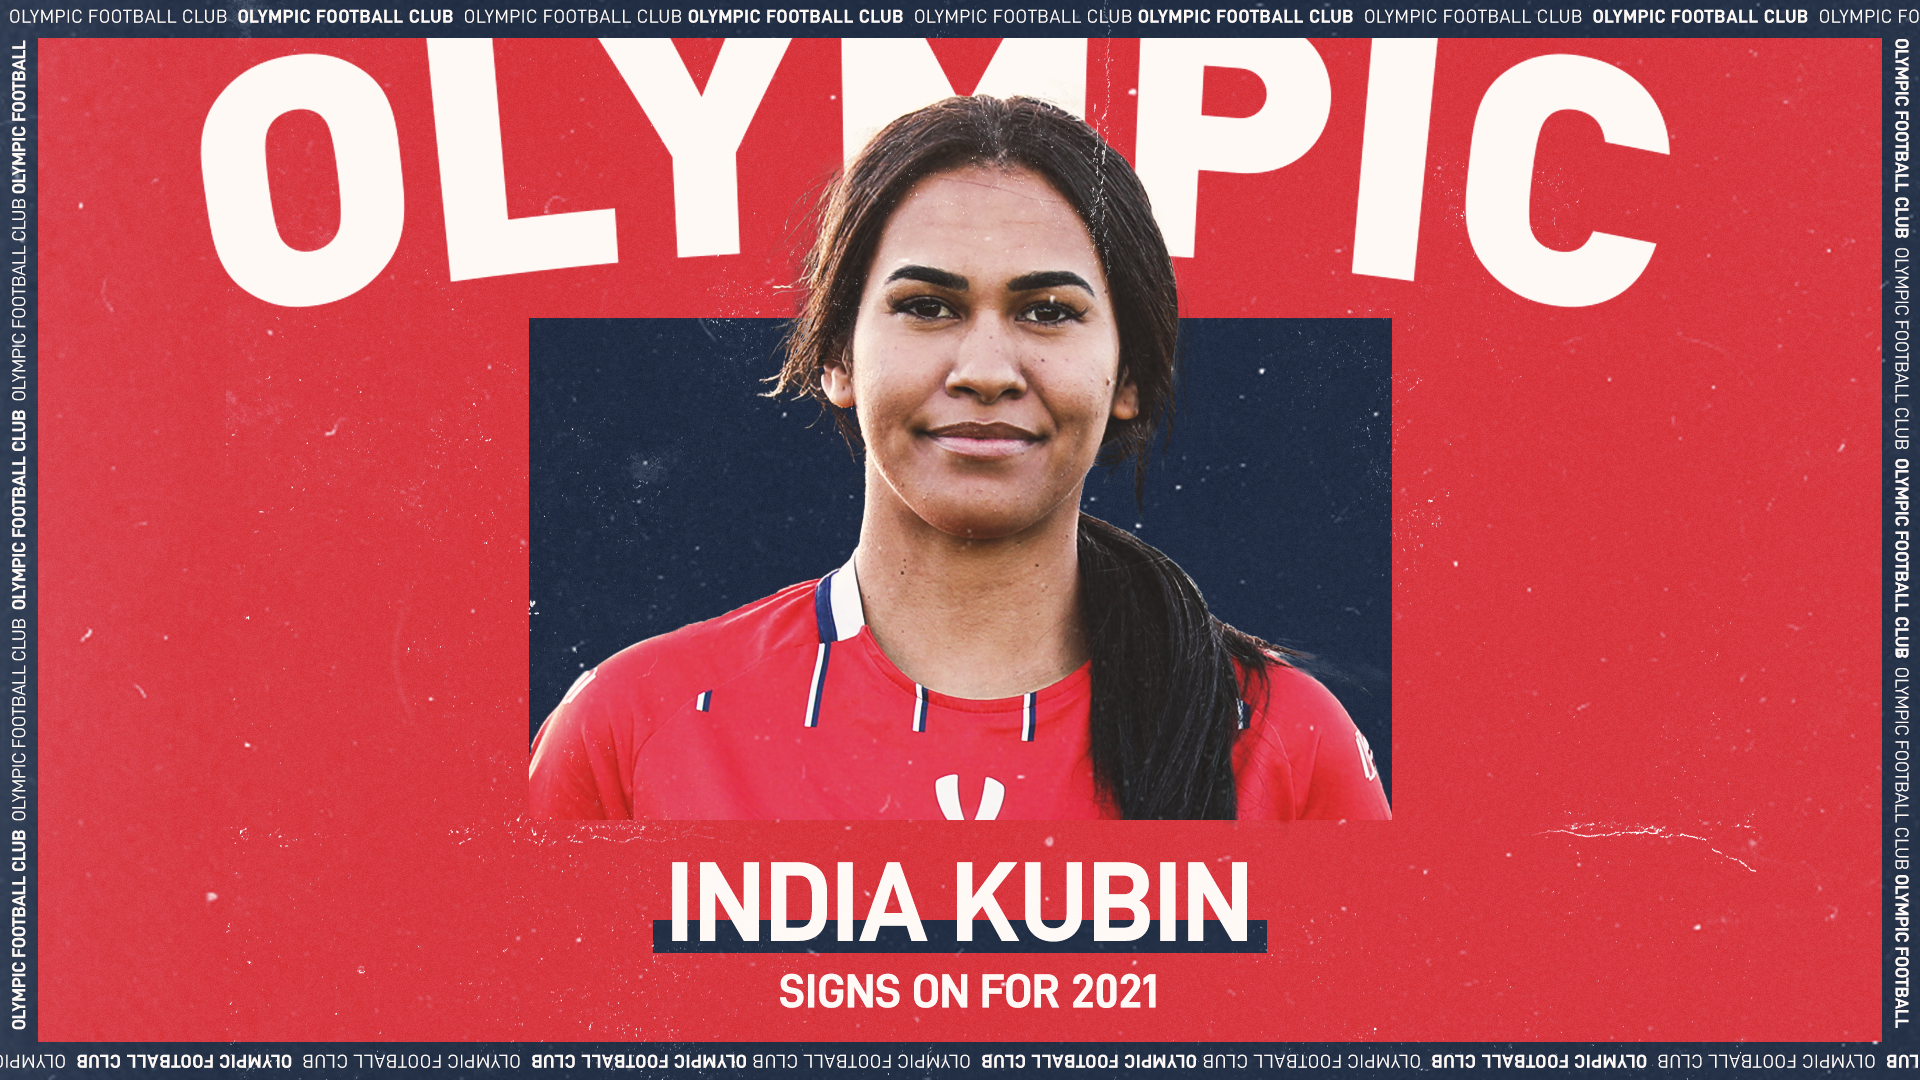 Kubin signs on for 2021 season